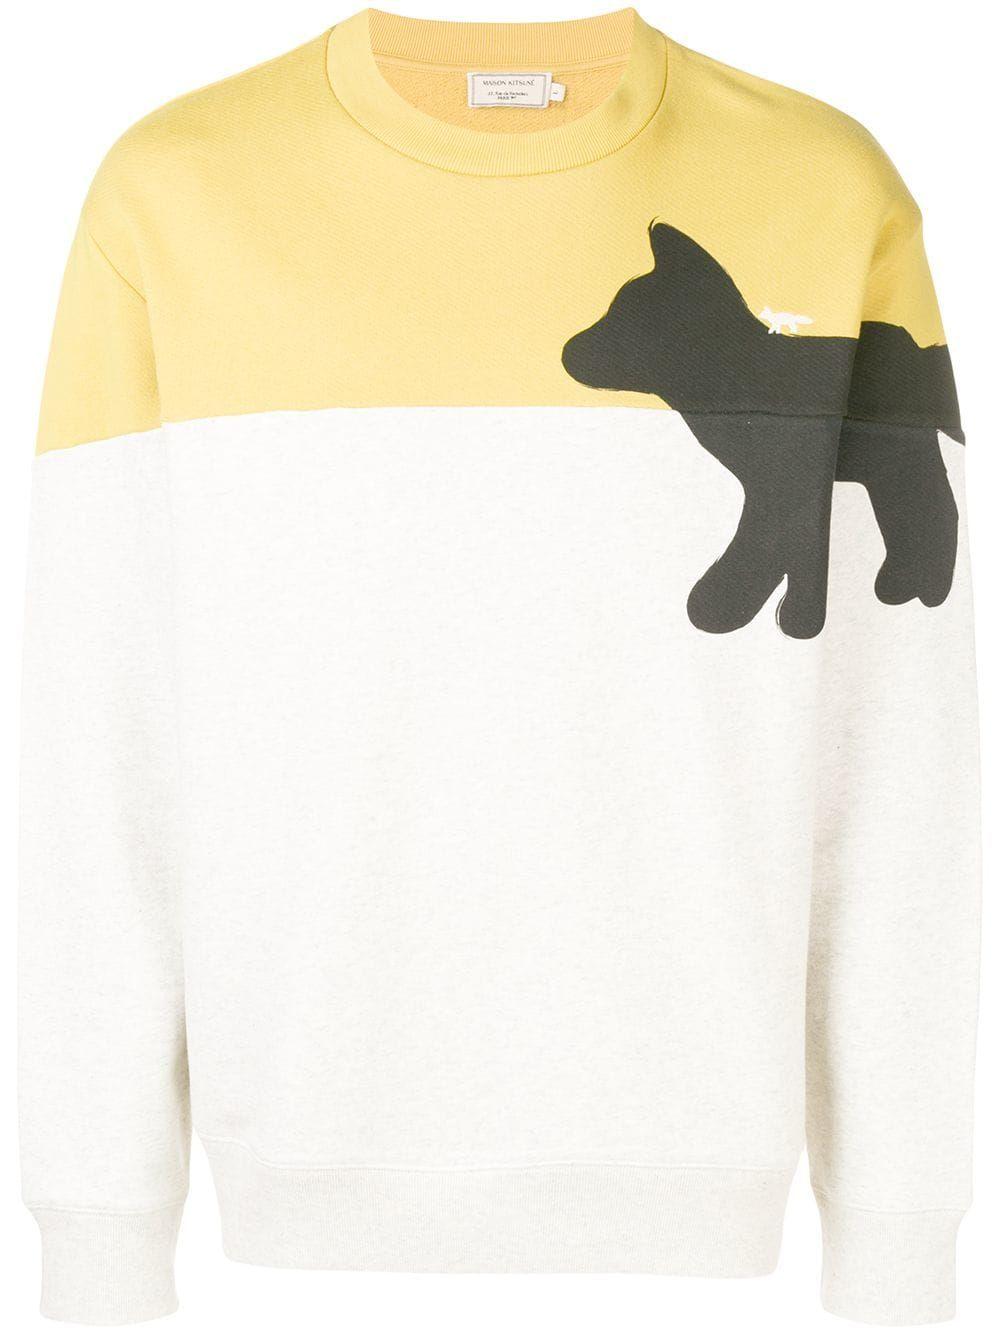 Maison Kitsune Sweatshirt With Walking Fox Print In Yellow Modesens Maison Kitsune Sweatshirts Fox Print [ 1334 x 1000 Pixel ]